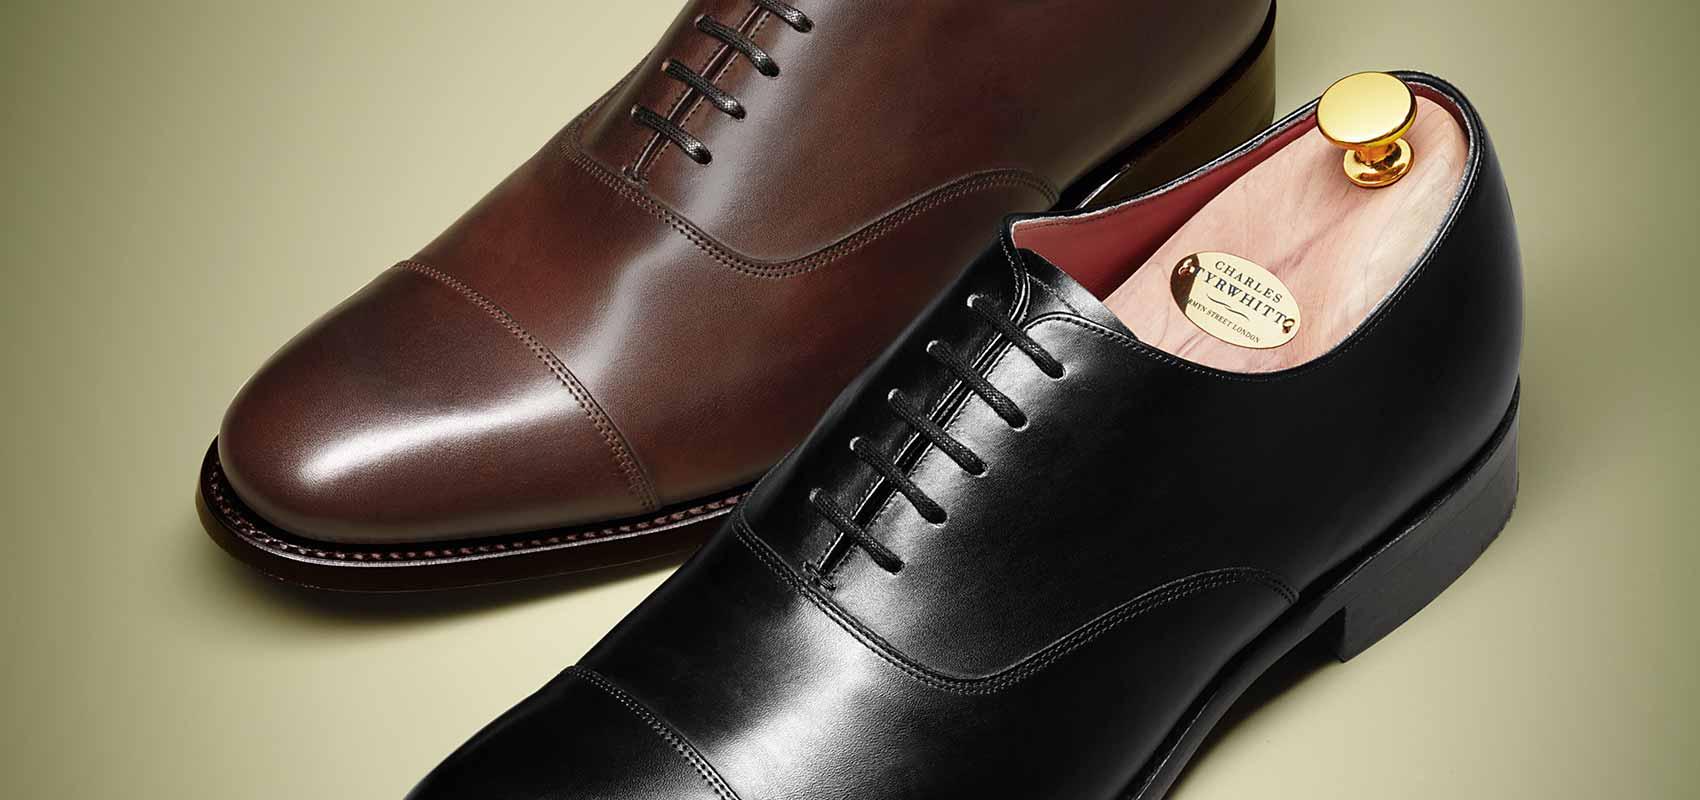 Charles Tyrwhitt Chaussures Oxford